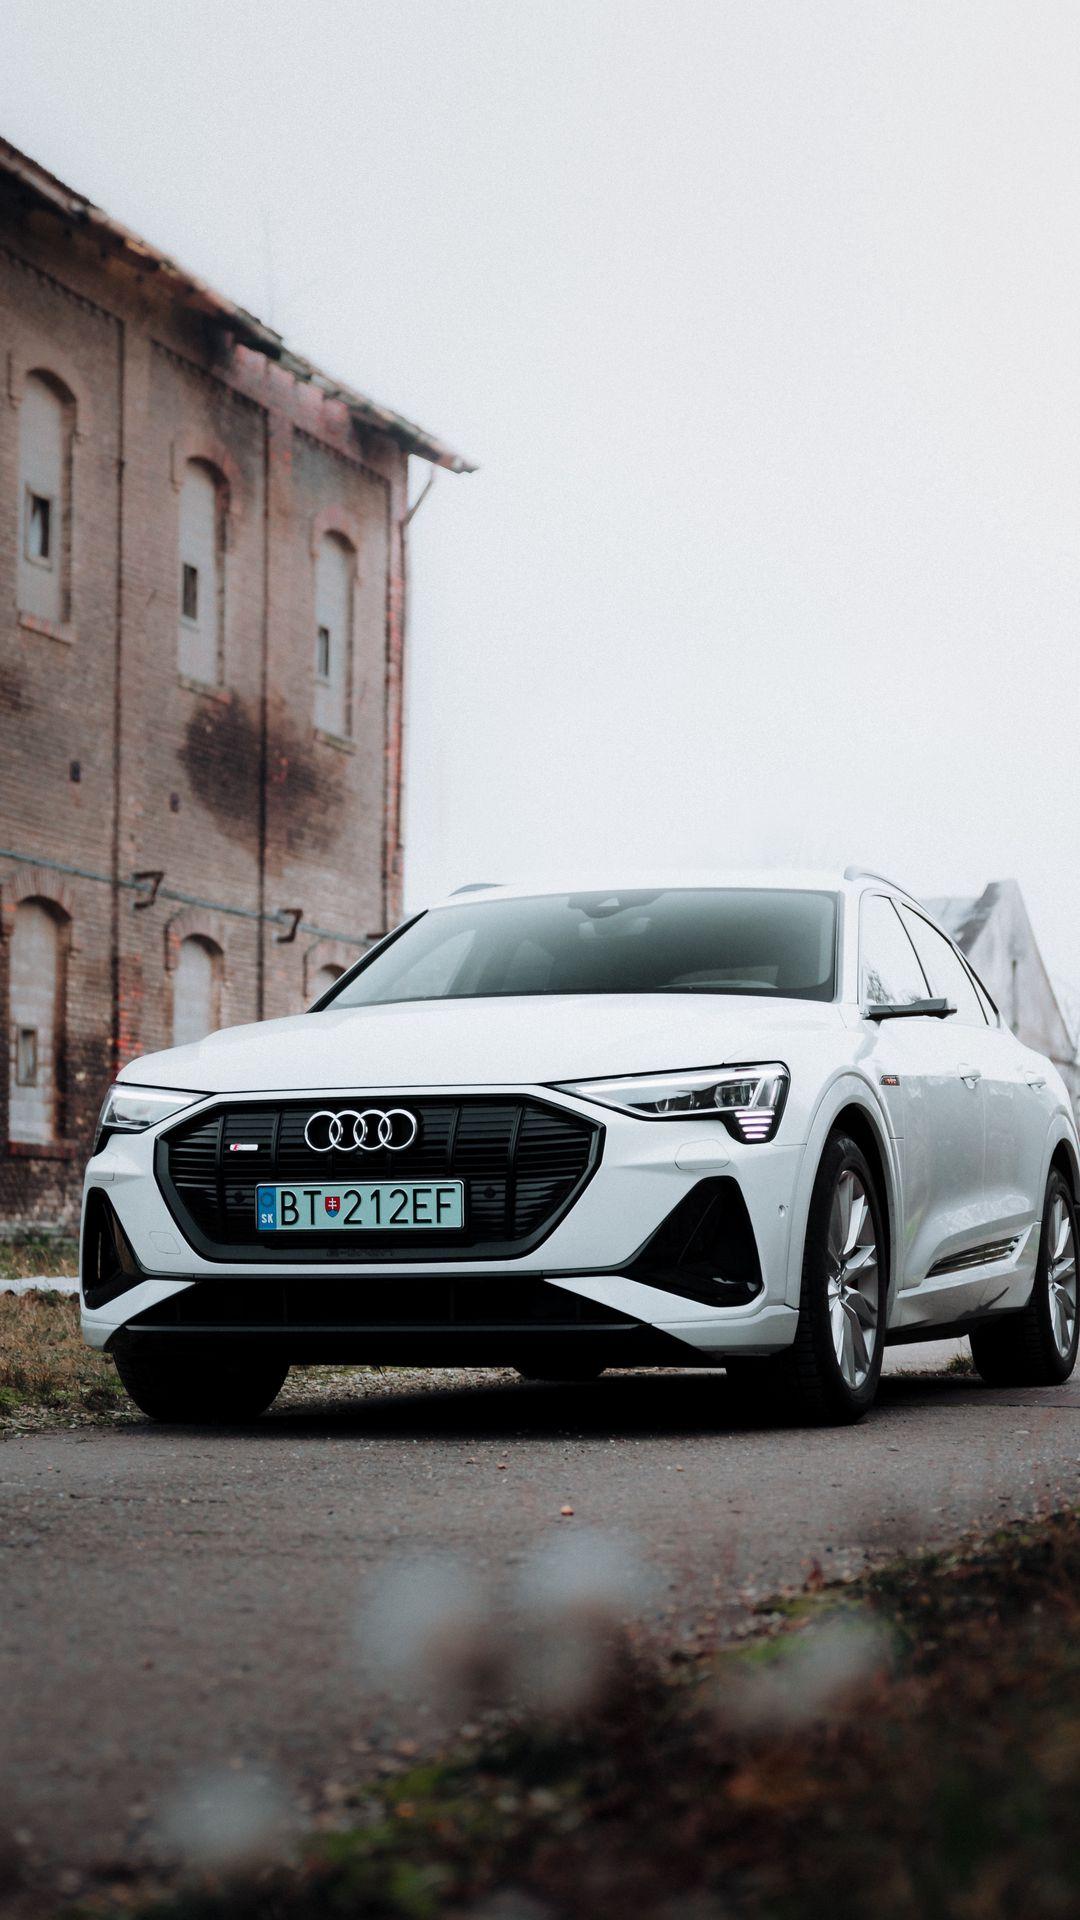 Audi White Car HD Wallpapers Free Download